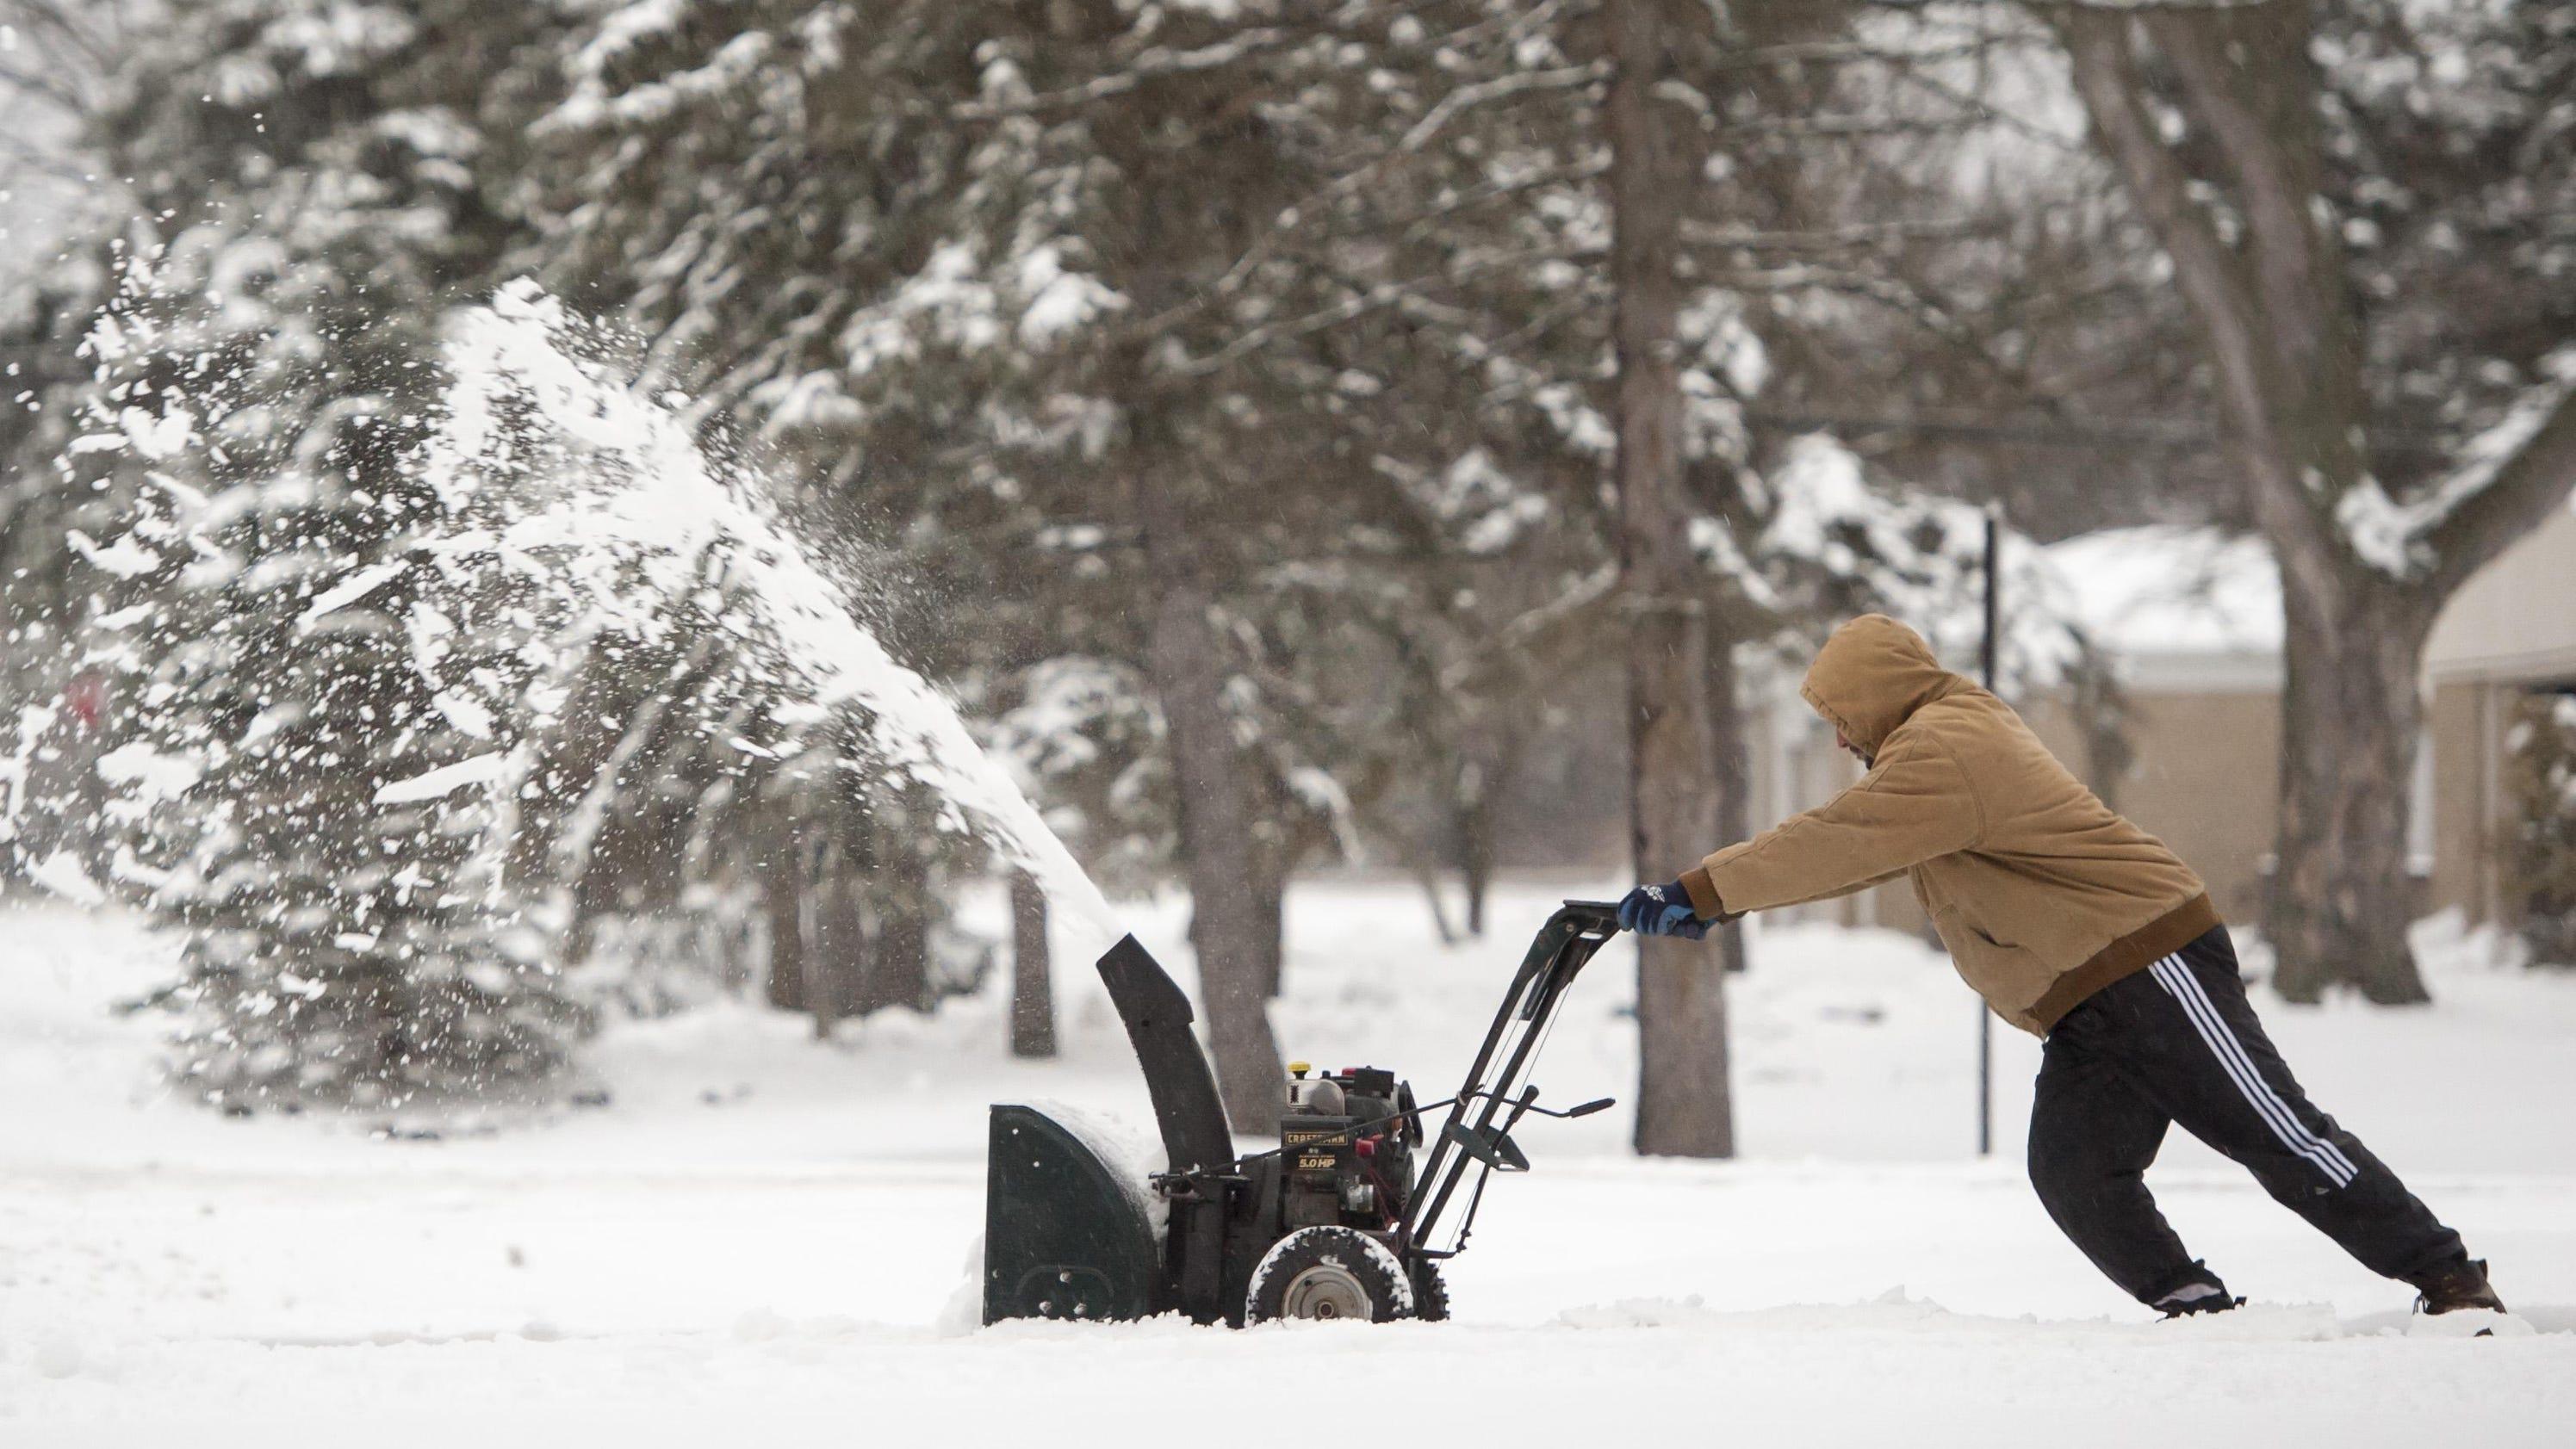 Snow Thursday, then more seasonable weekend